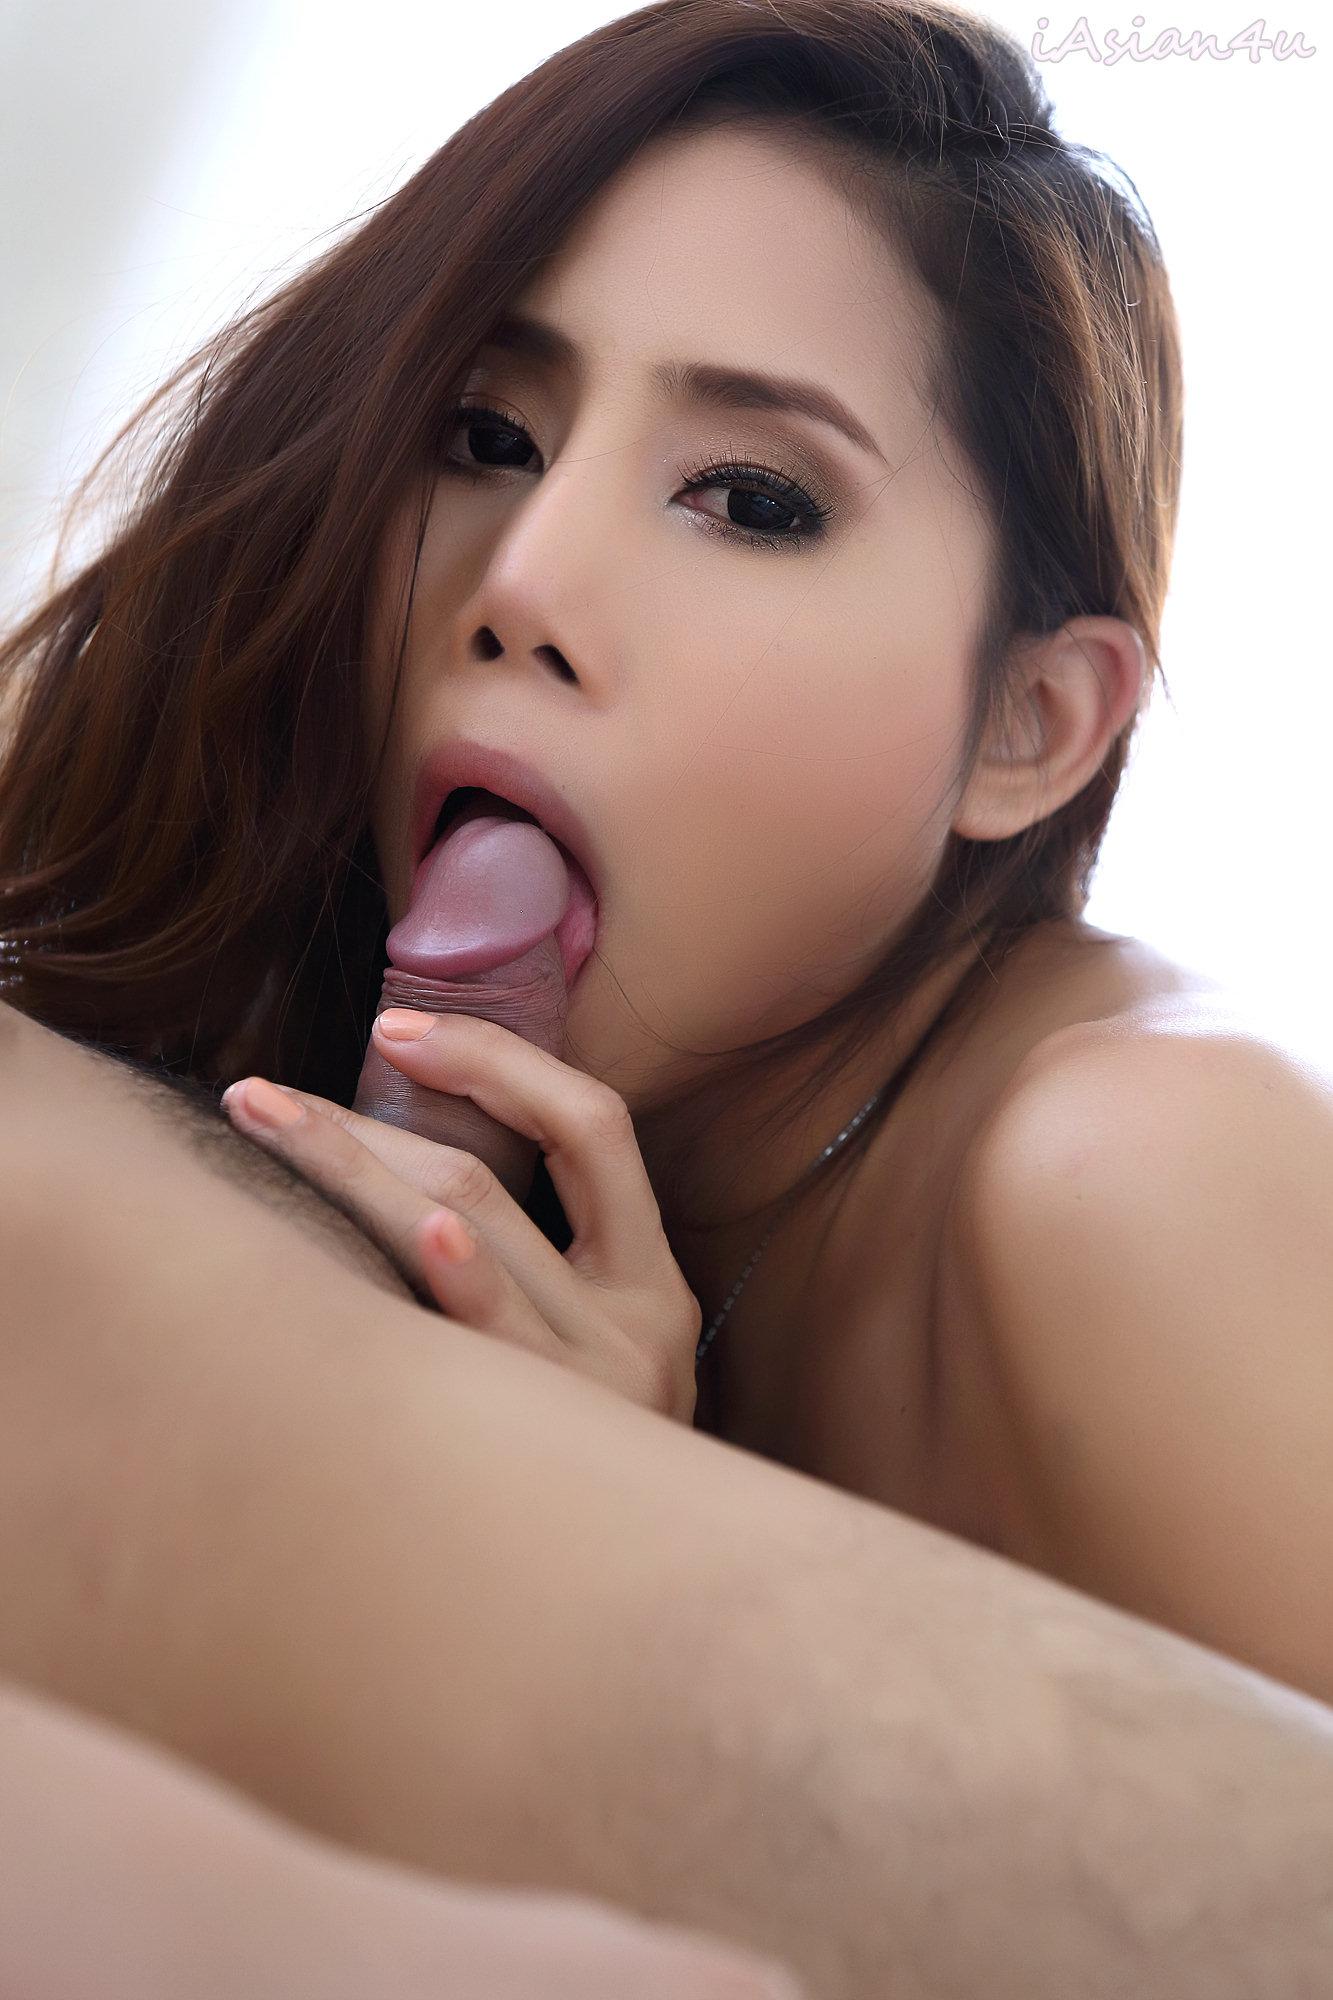 Having sex with asian wemon